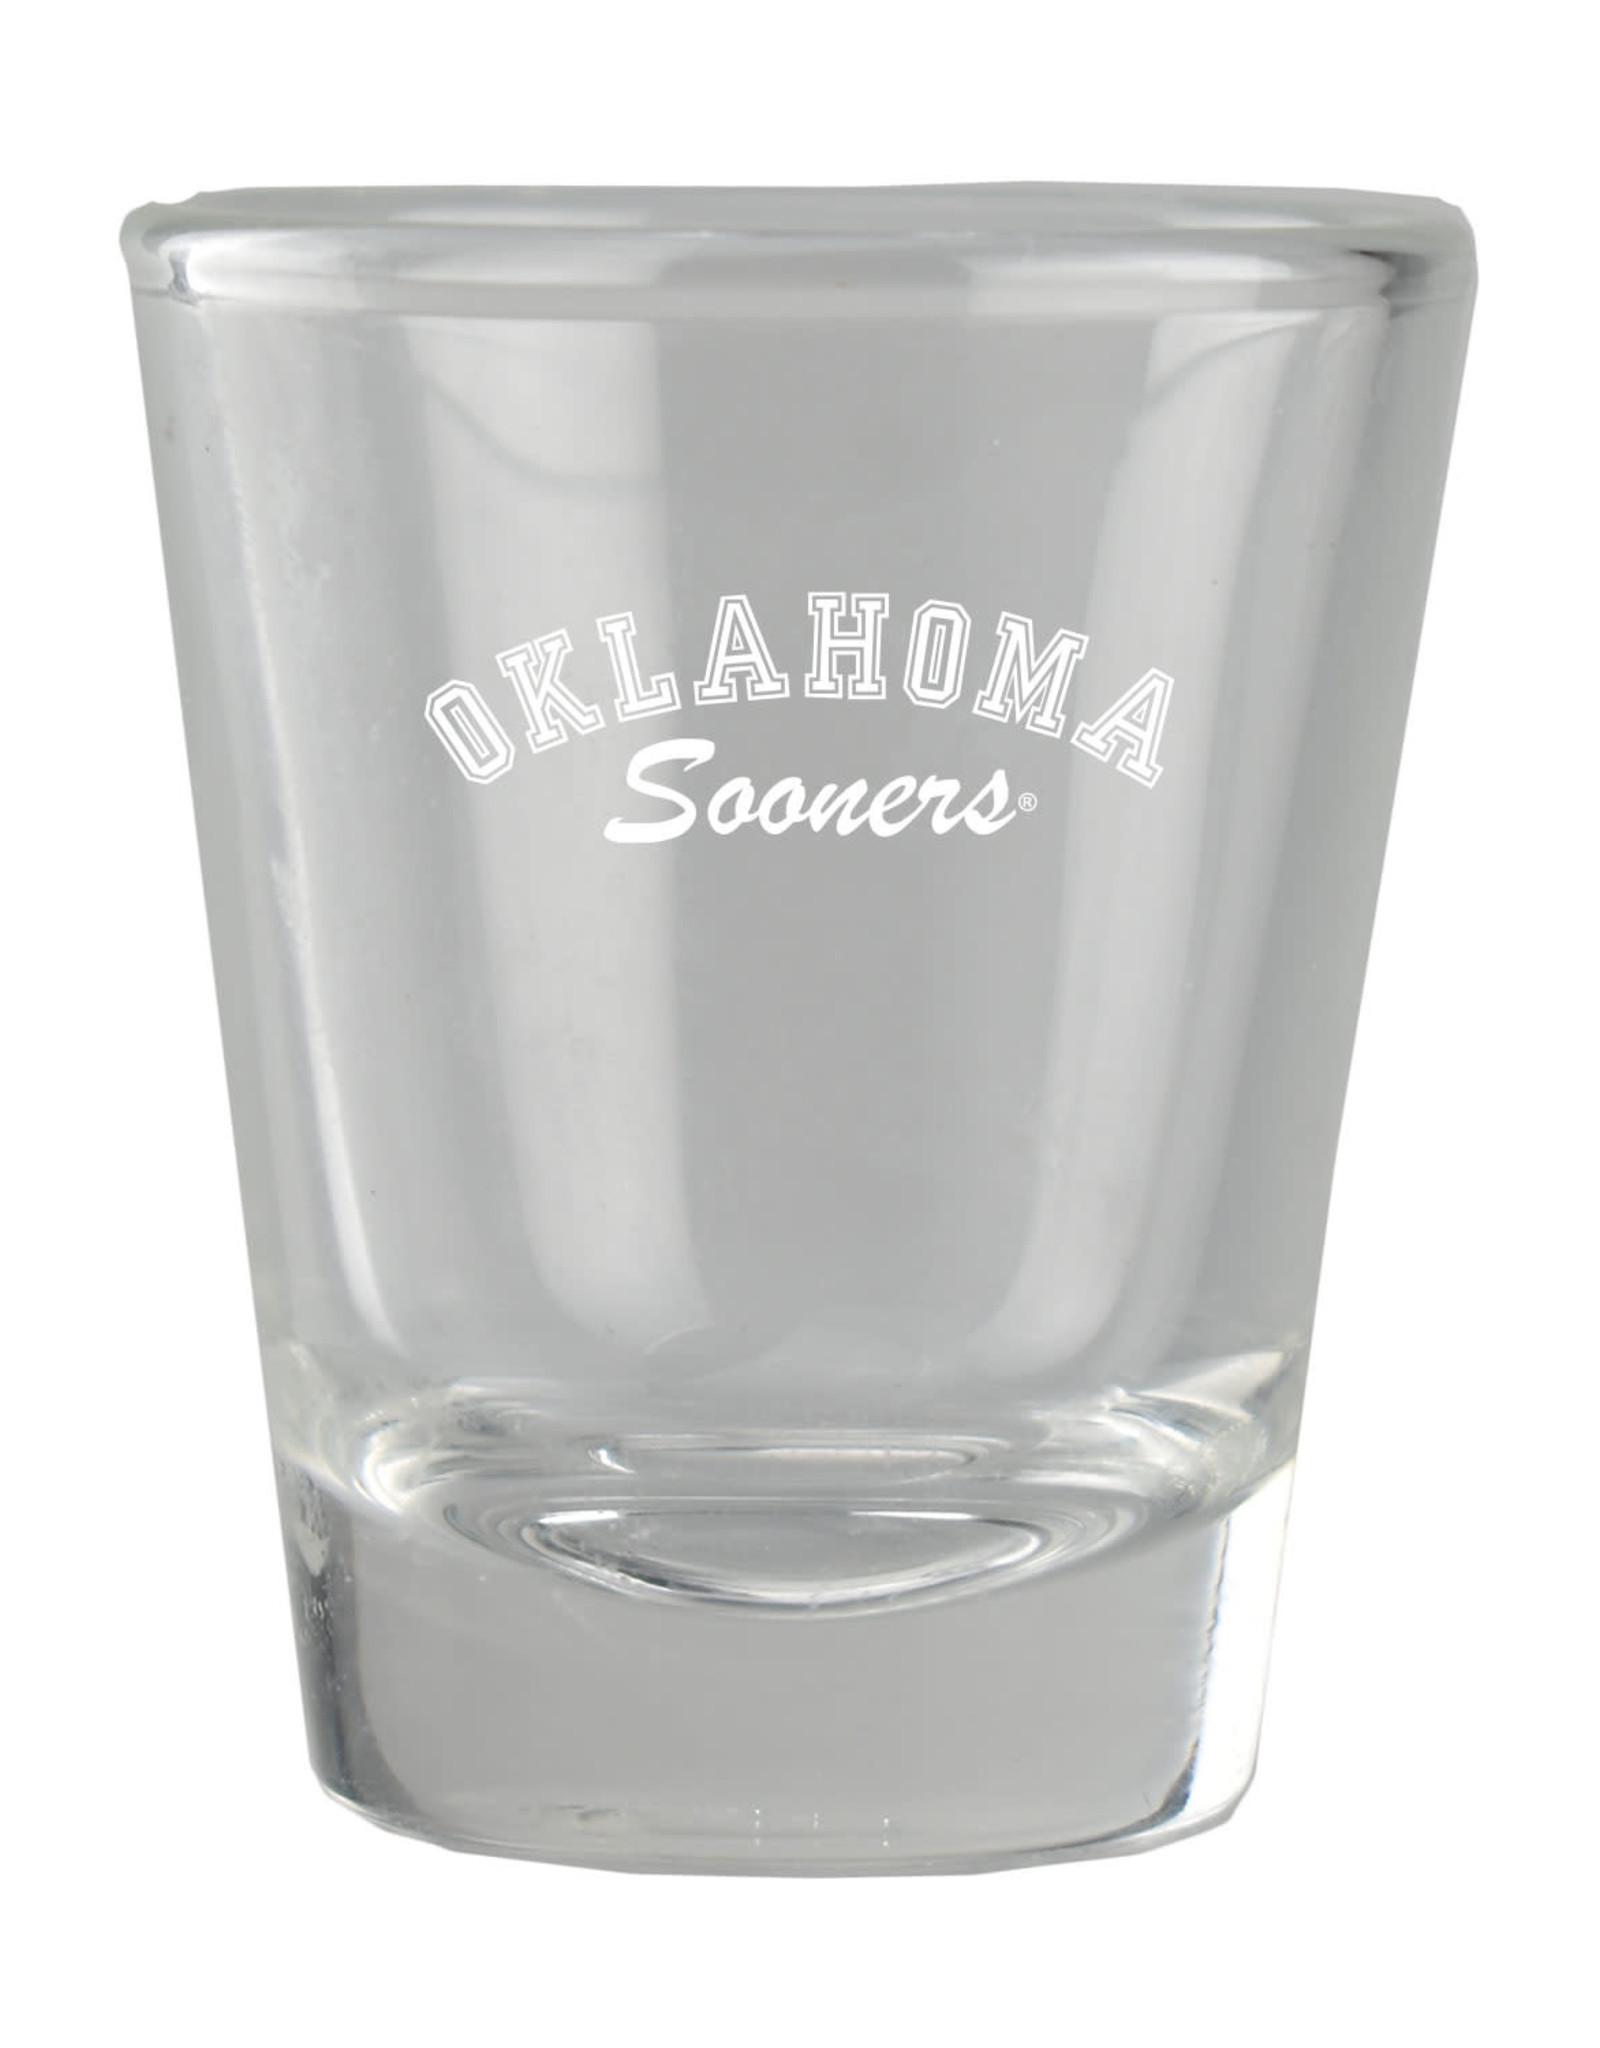 LXG Etched Oklahoma Sooners 1.5oz Shot